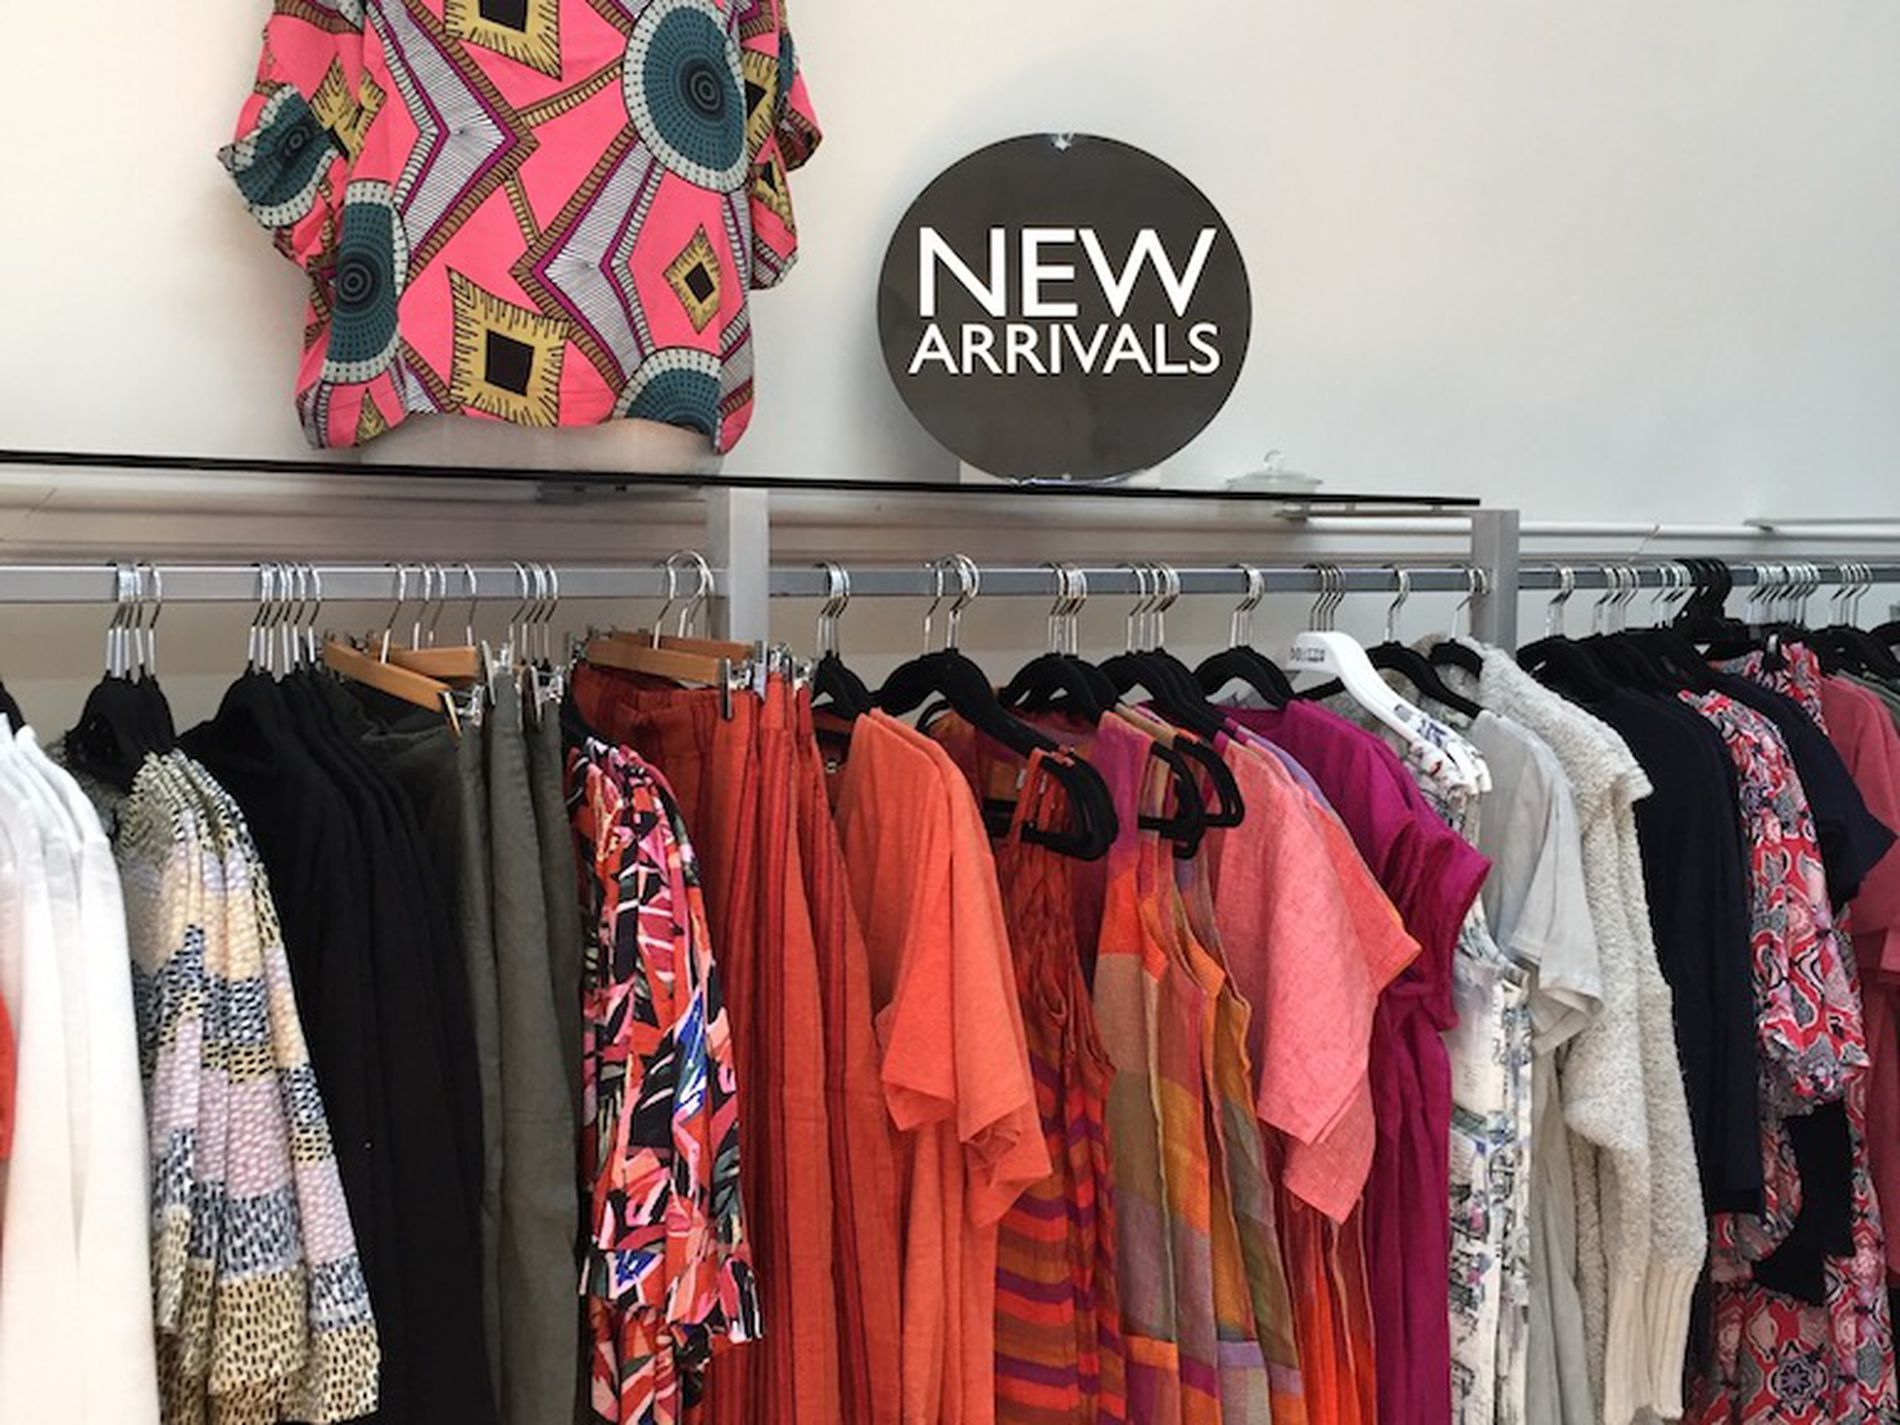 Women's Fashion Retail Business for Sale